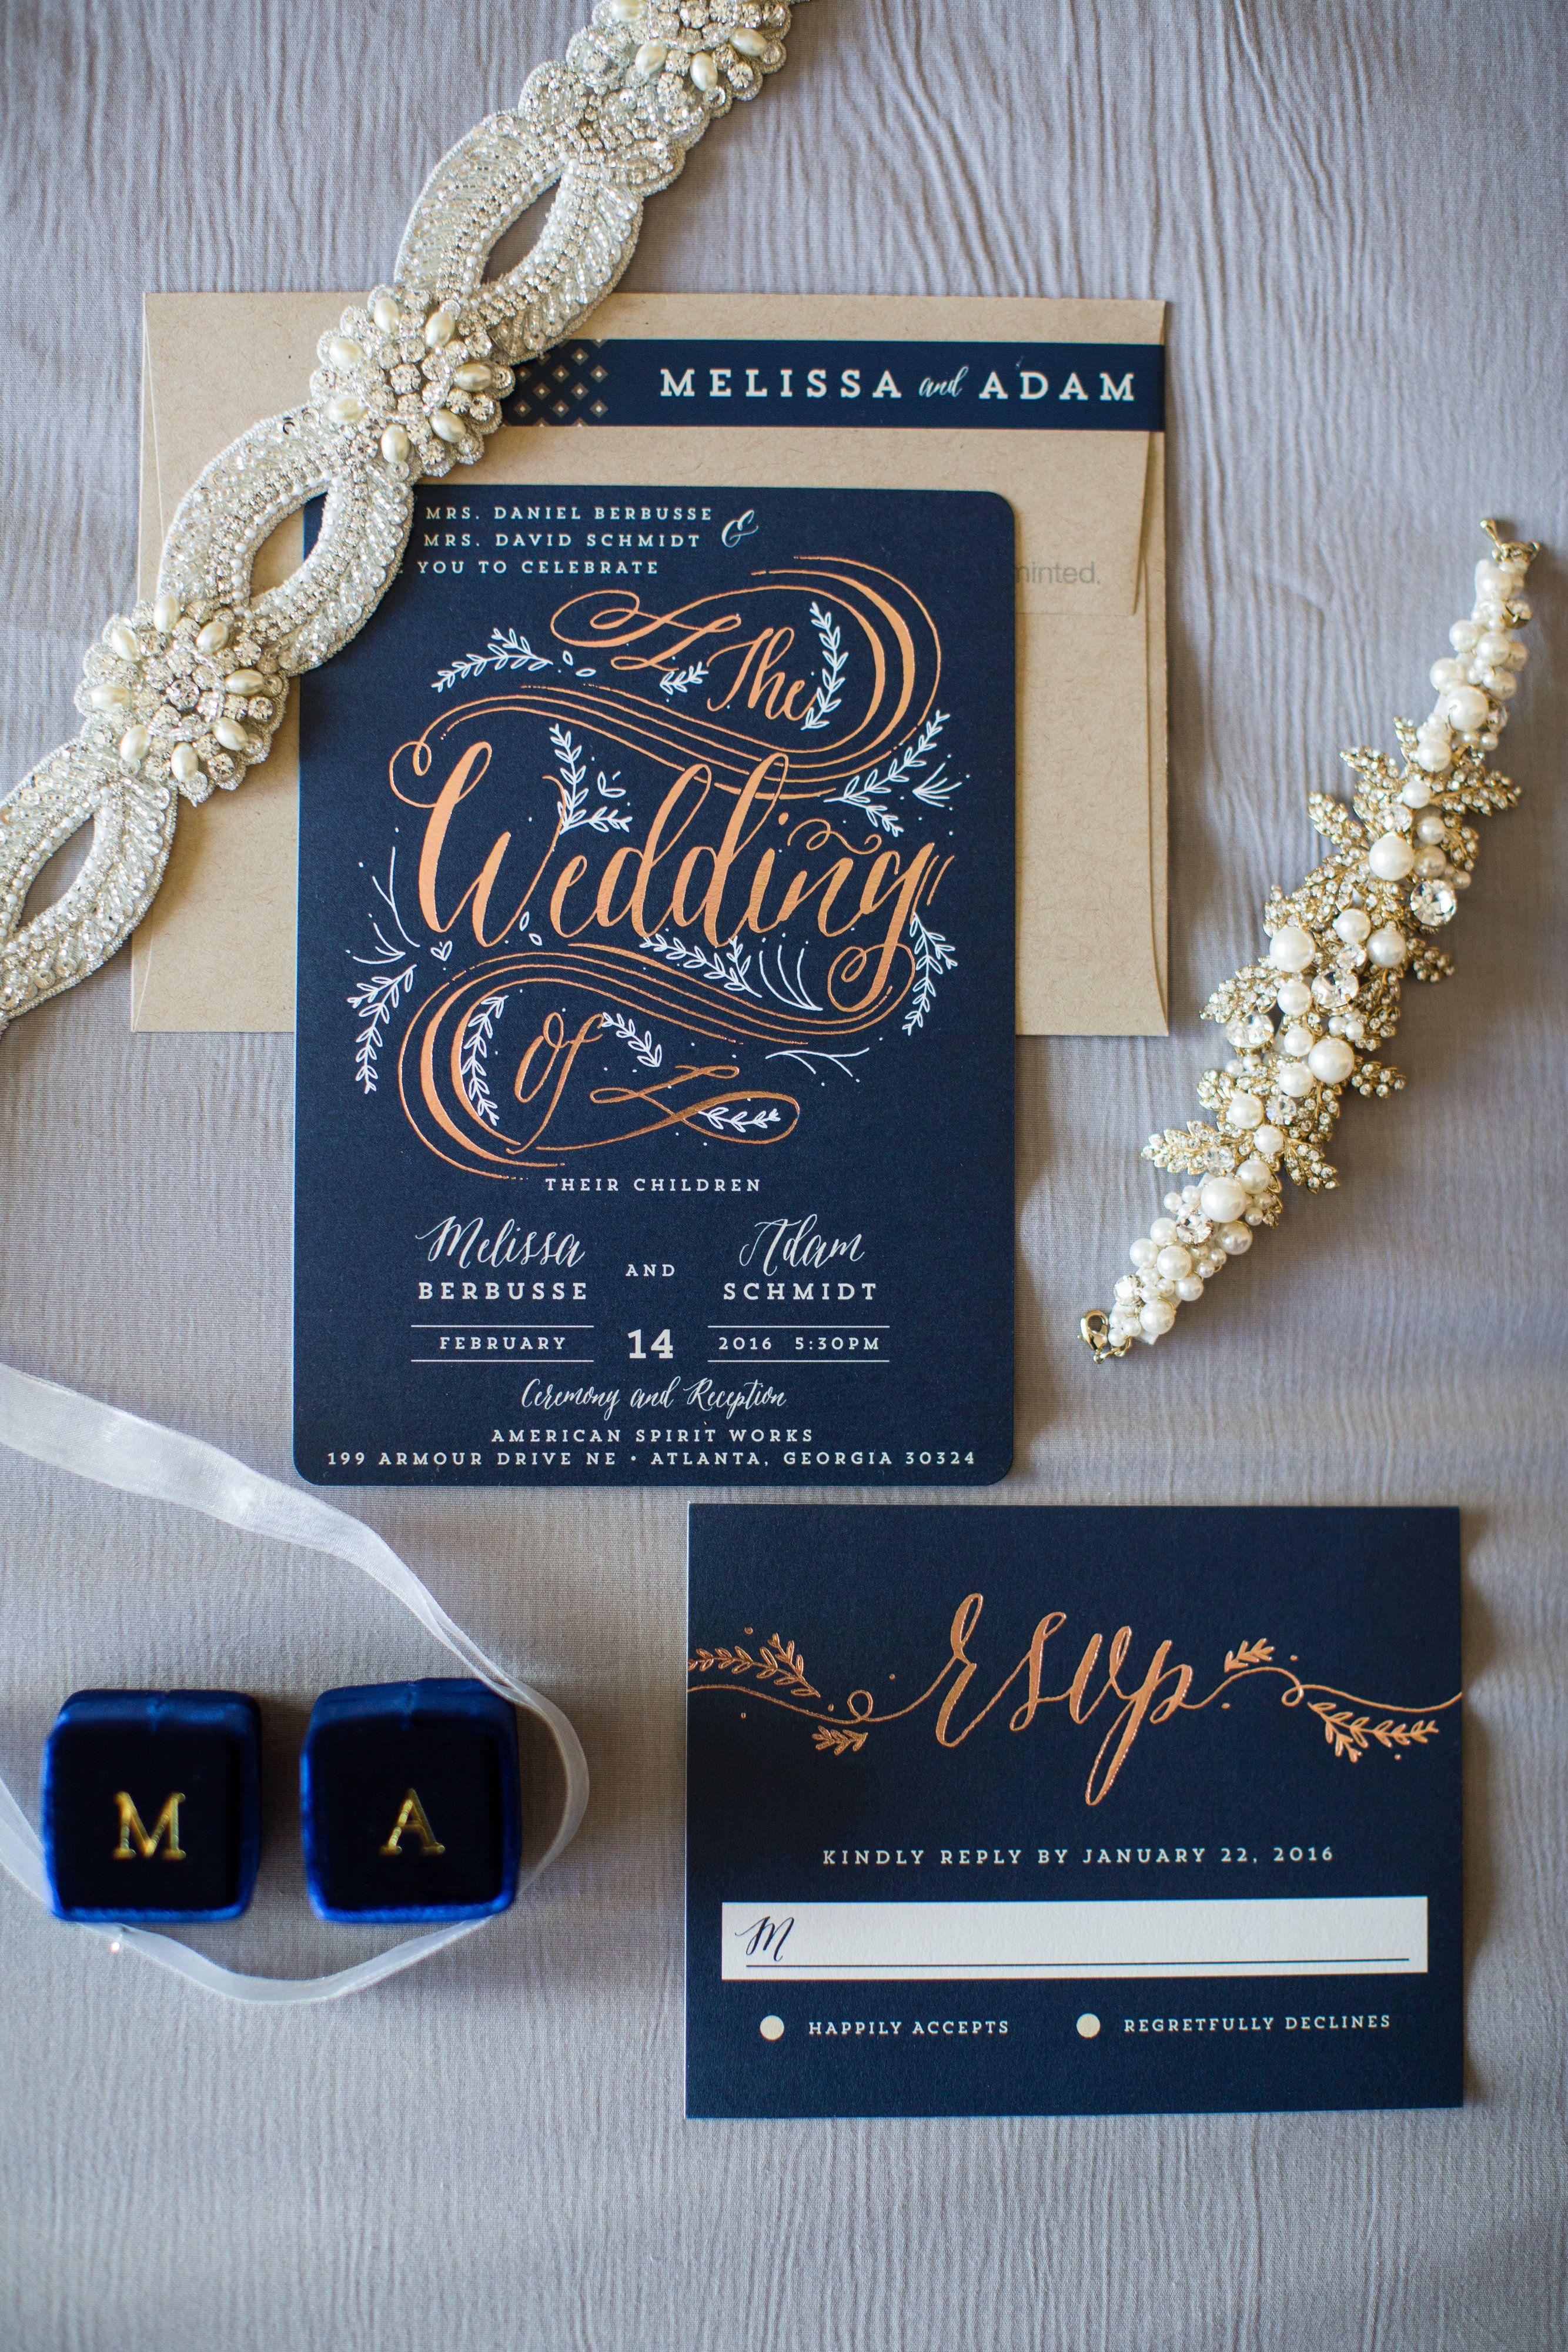 custom wedding invitation suite from mintedcom navy and gold winter wedding - Wedding Invitations Atlanta